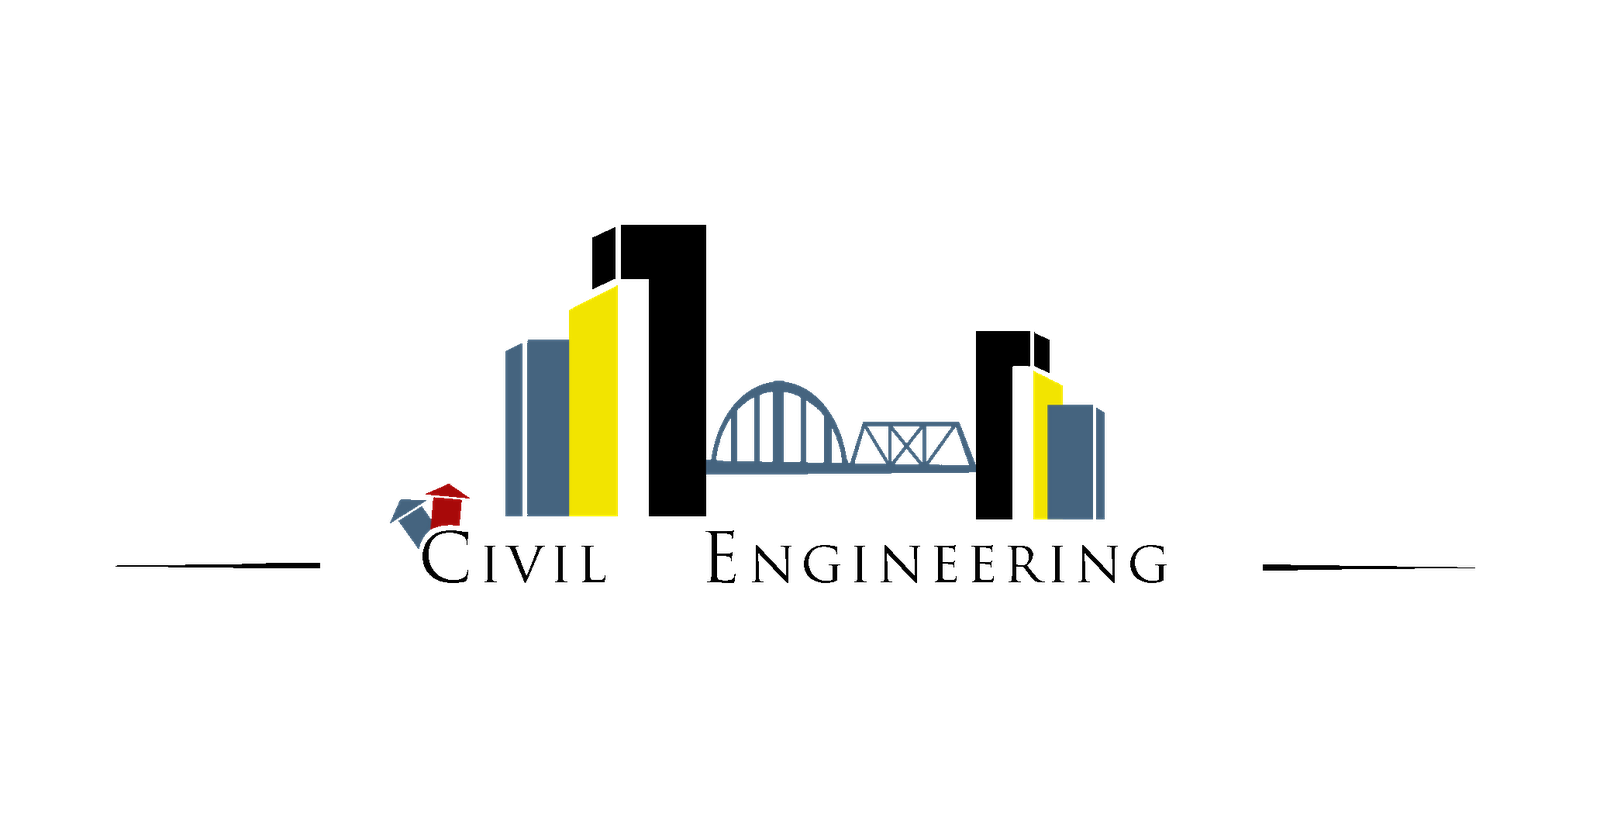 civil engineering logo google search [ 1600 x 828 Pixel ]